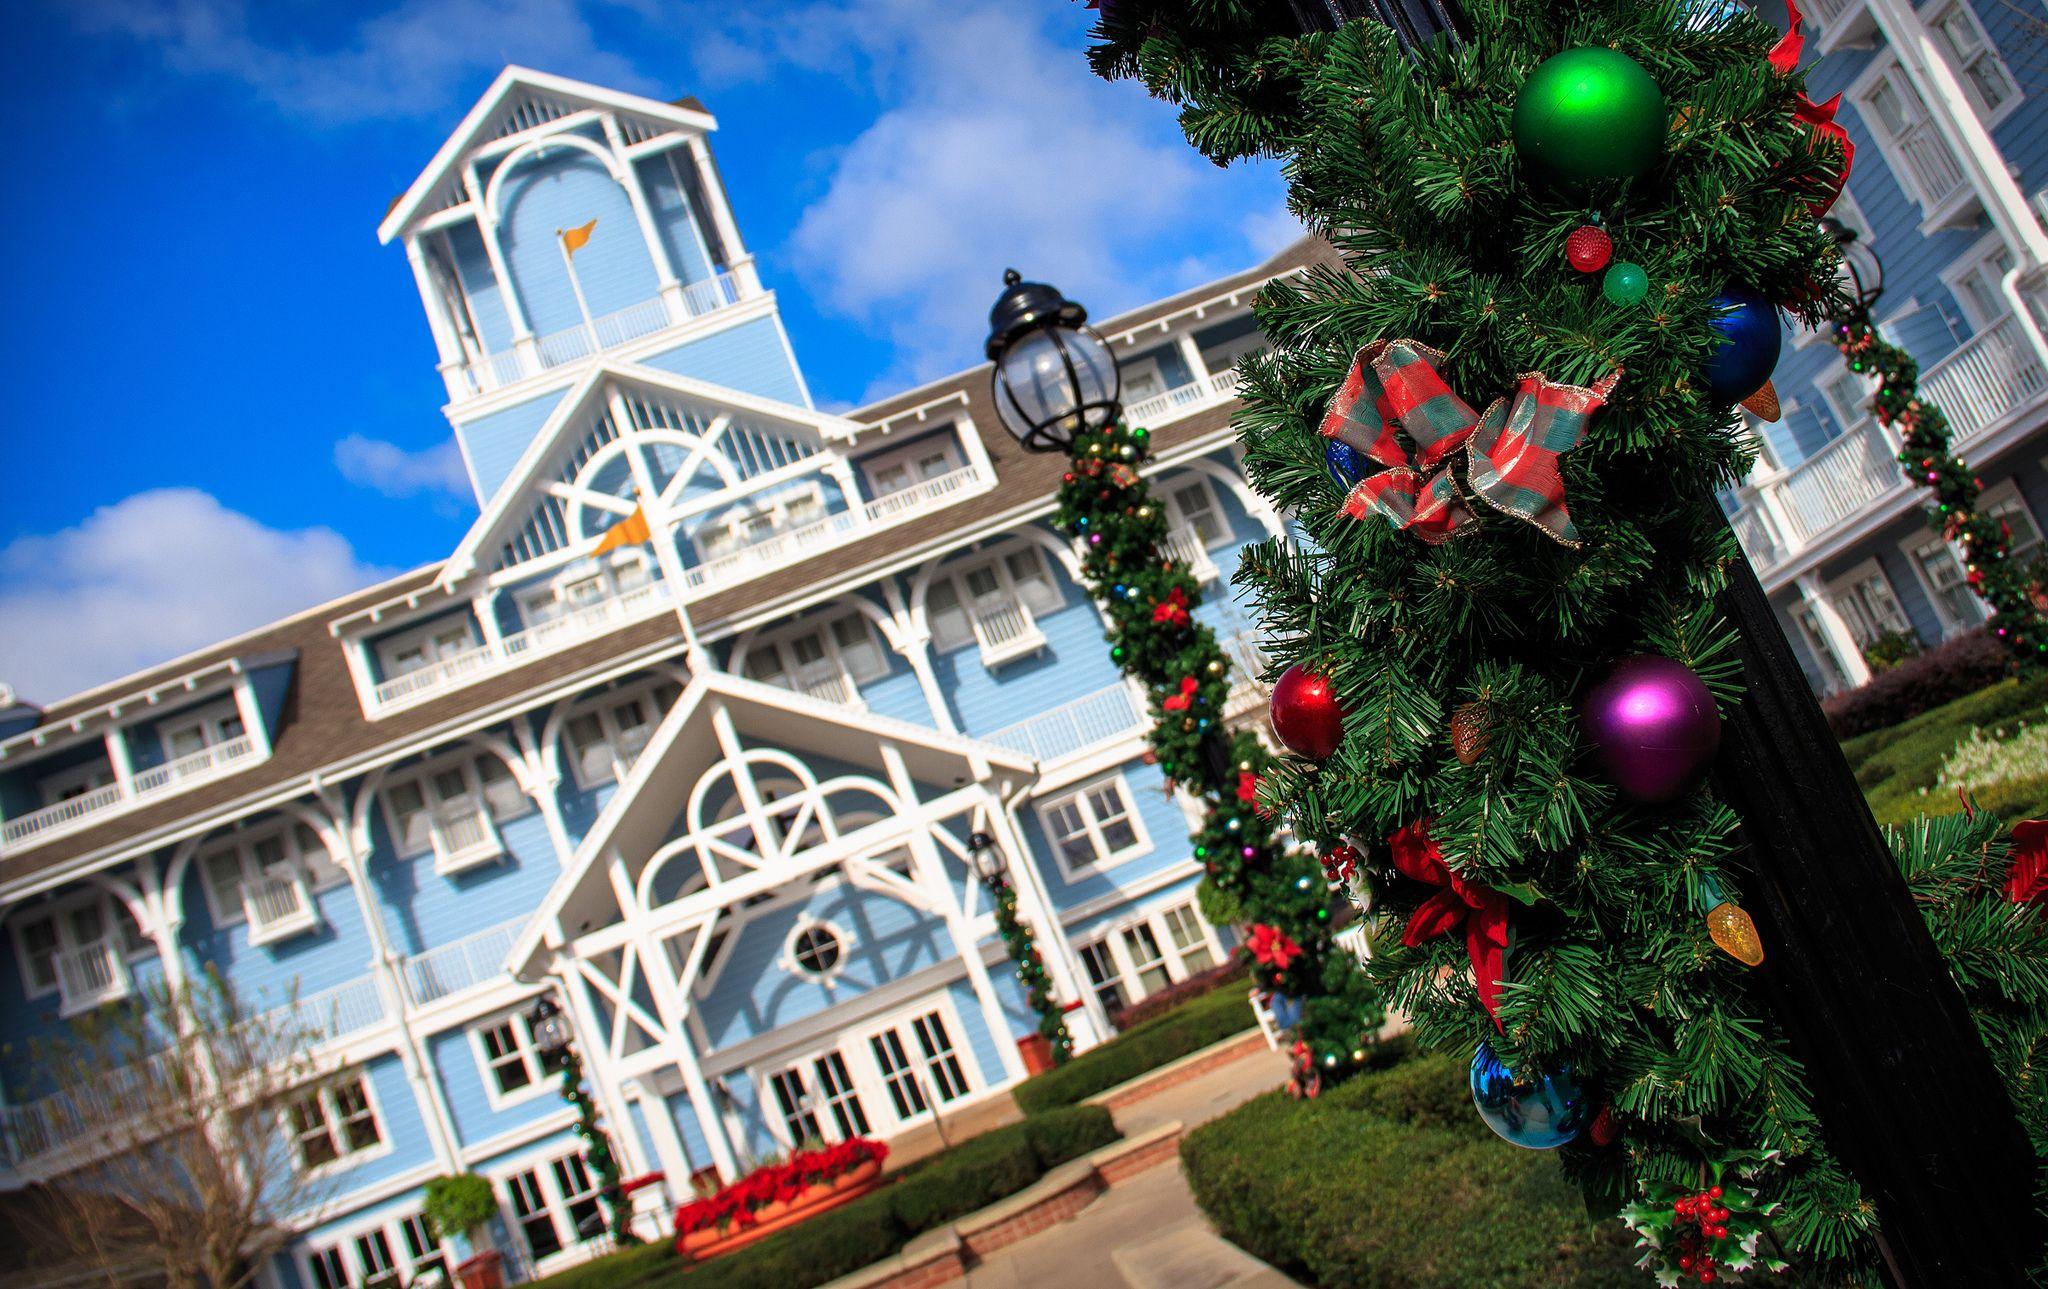 Christmas Setups.A Beach Club Christmas Disney World 28 4186 N 81 5811 W